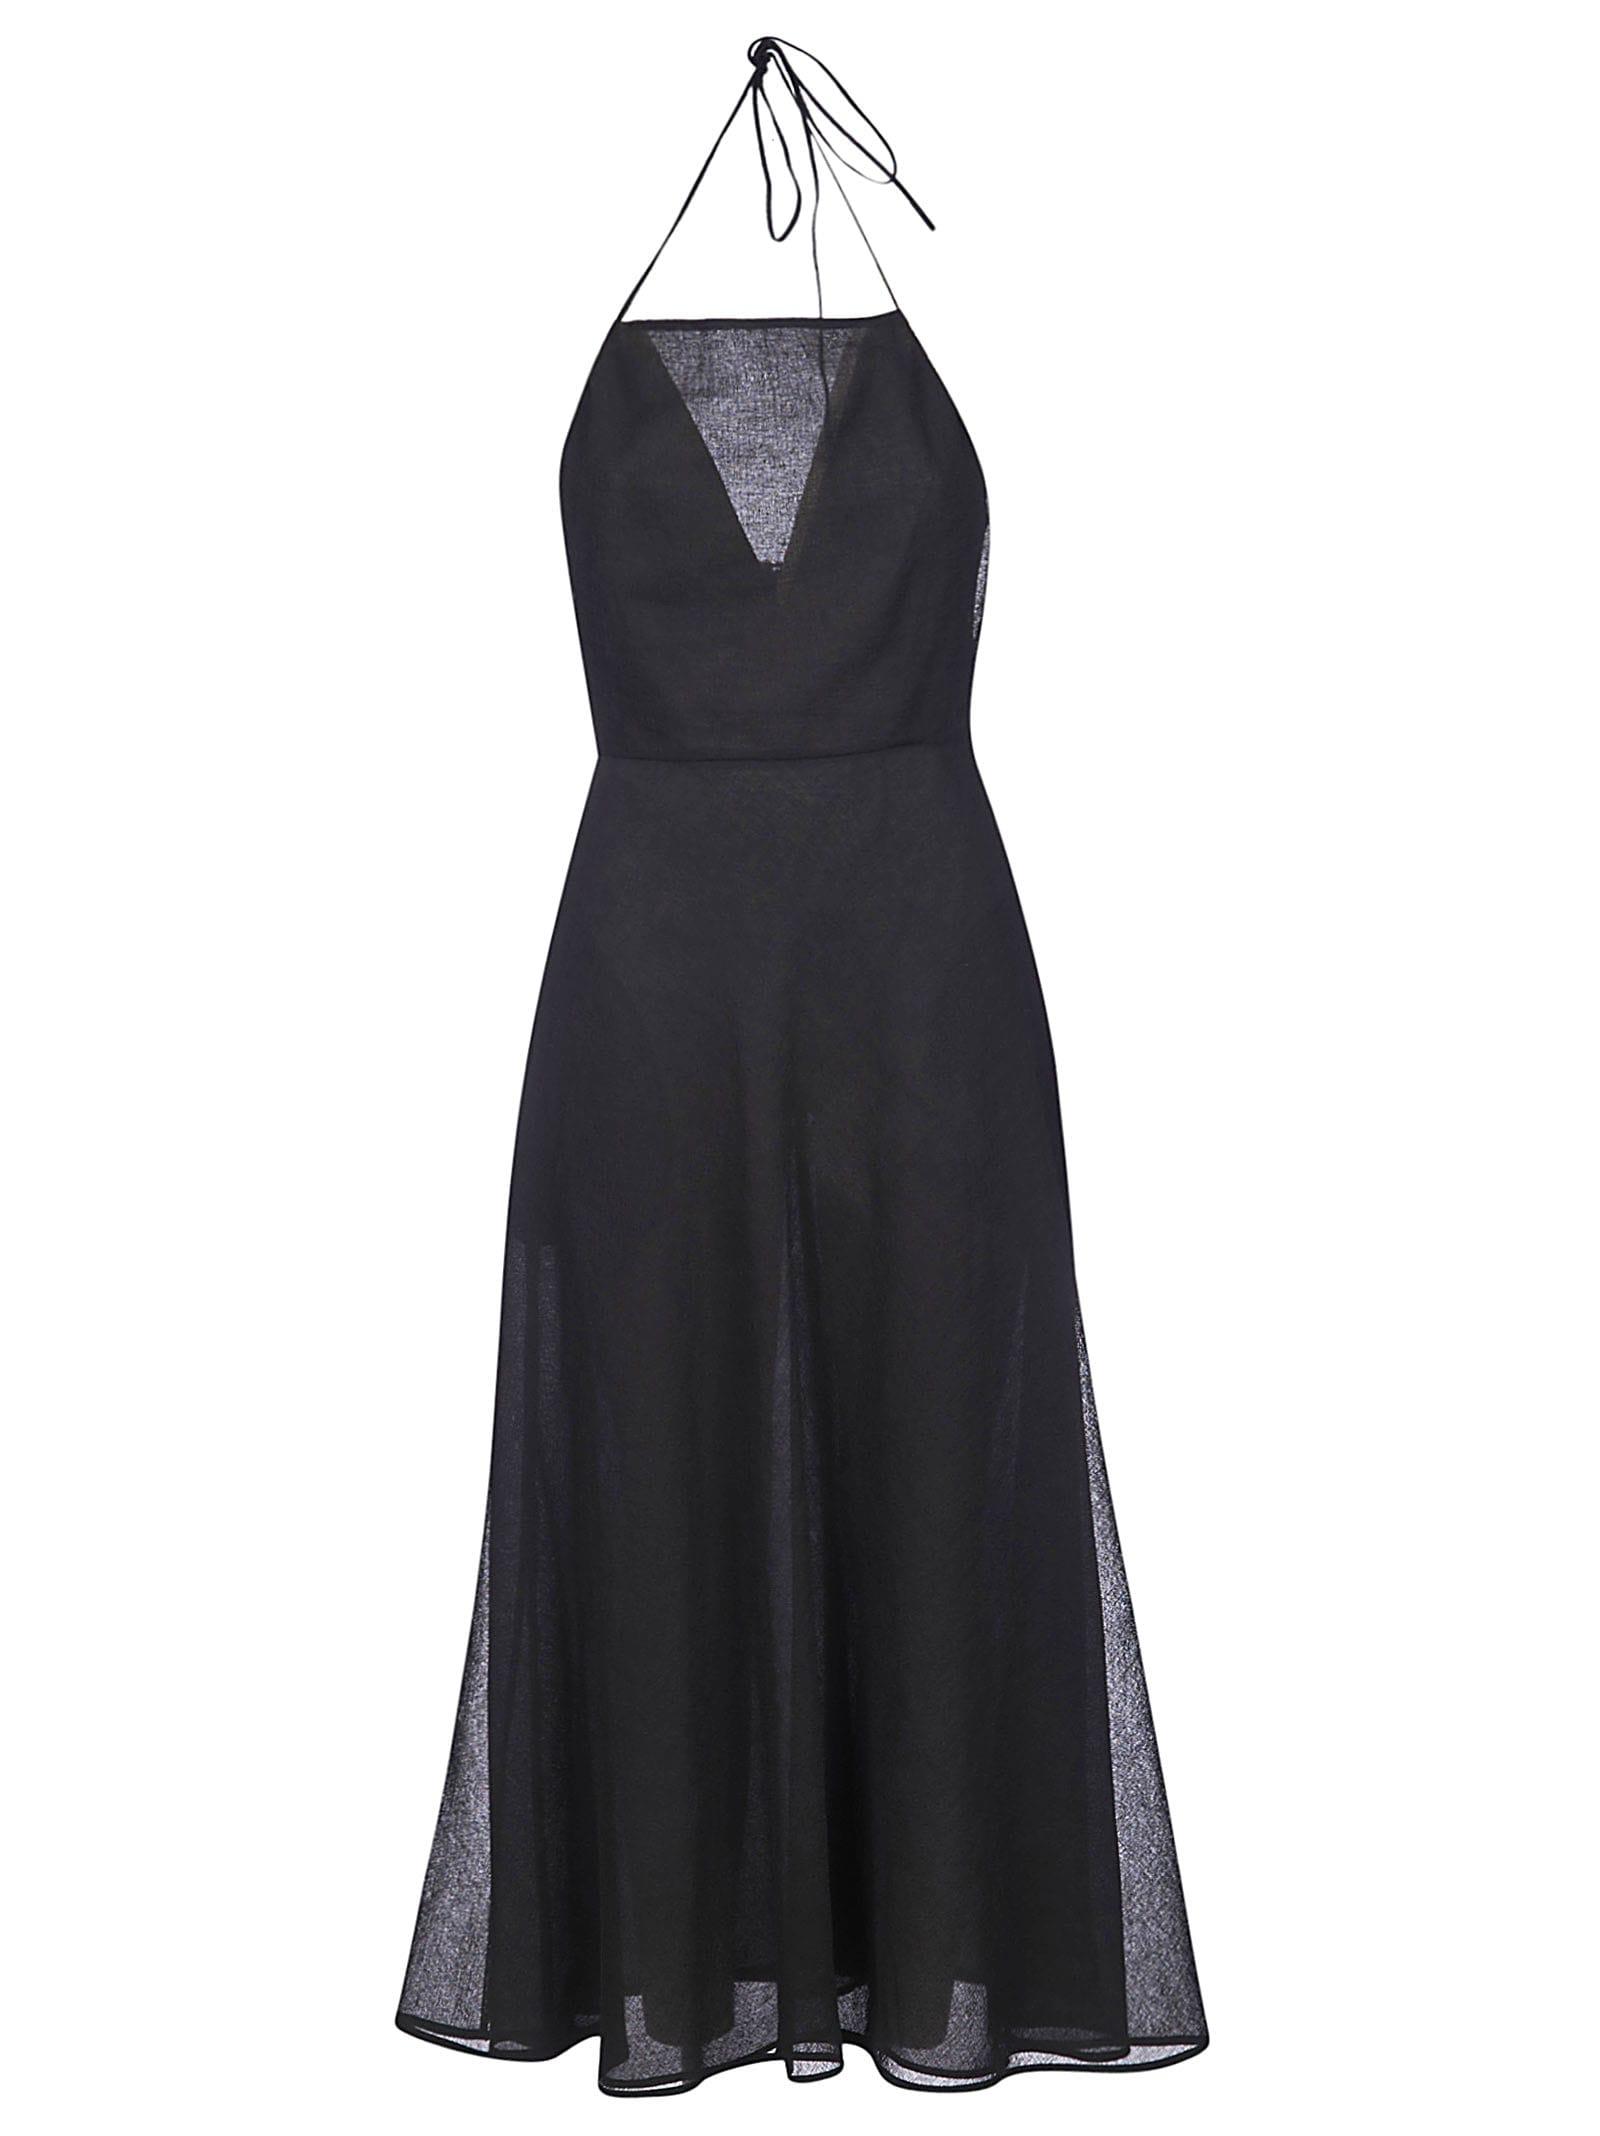 Buy Jil Sander Sleeveless Flared Dress online, shop Jil Sander with free shipping